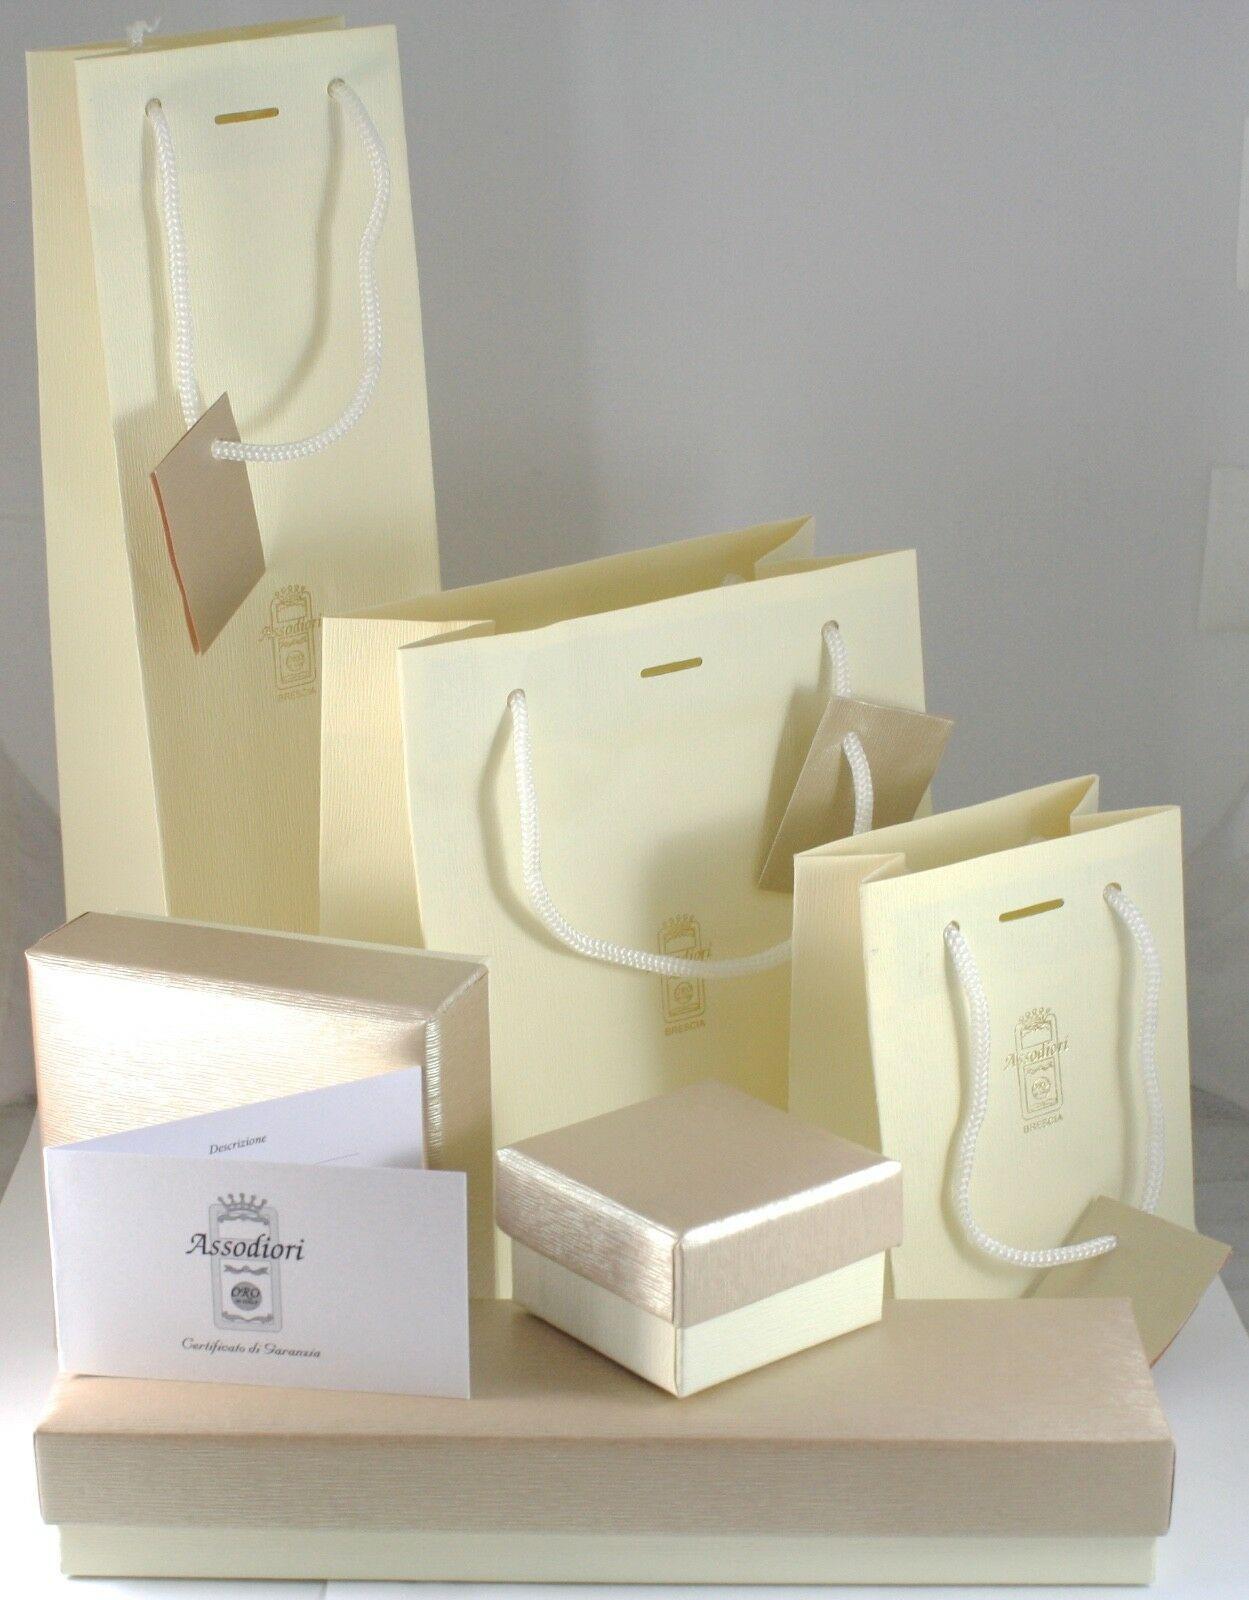 Bracelet White Gold 18K 750, Jersey Marina, Marinara, Crosspiece Criss Crossed image 5